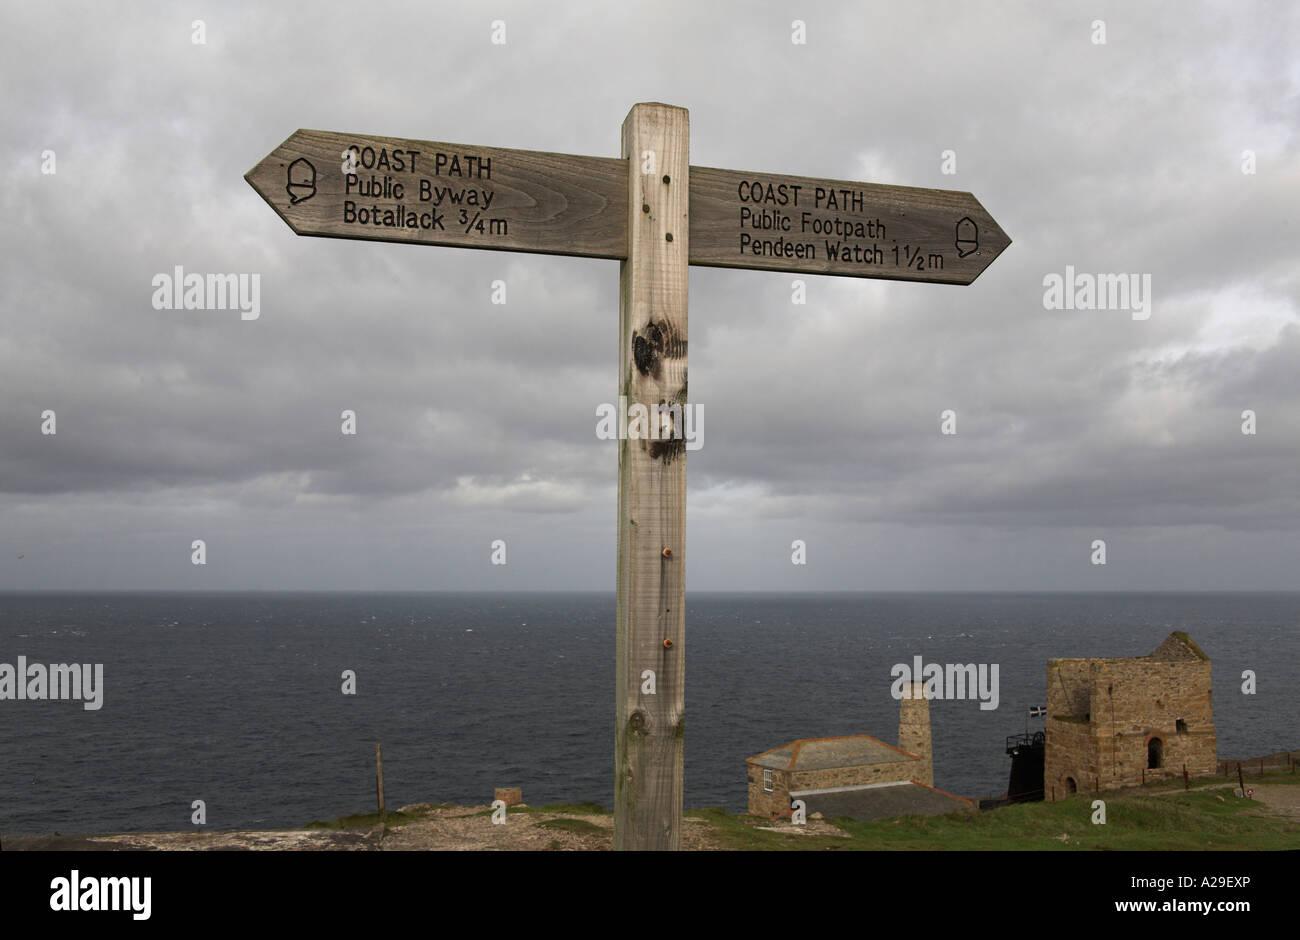 Southwest Coastal Footpath direction sign Levant Tin Mine Cornwall finger post - Stock Image